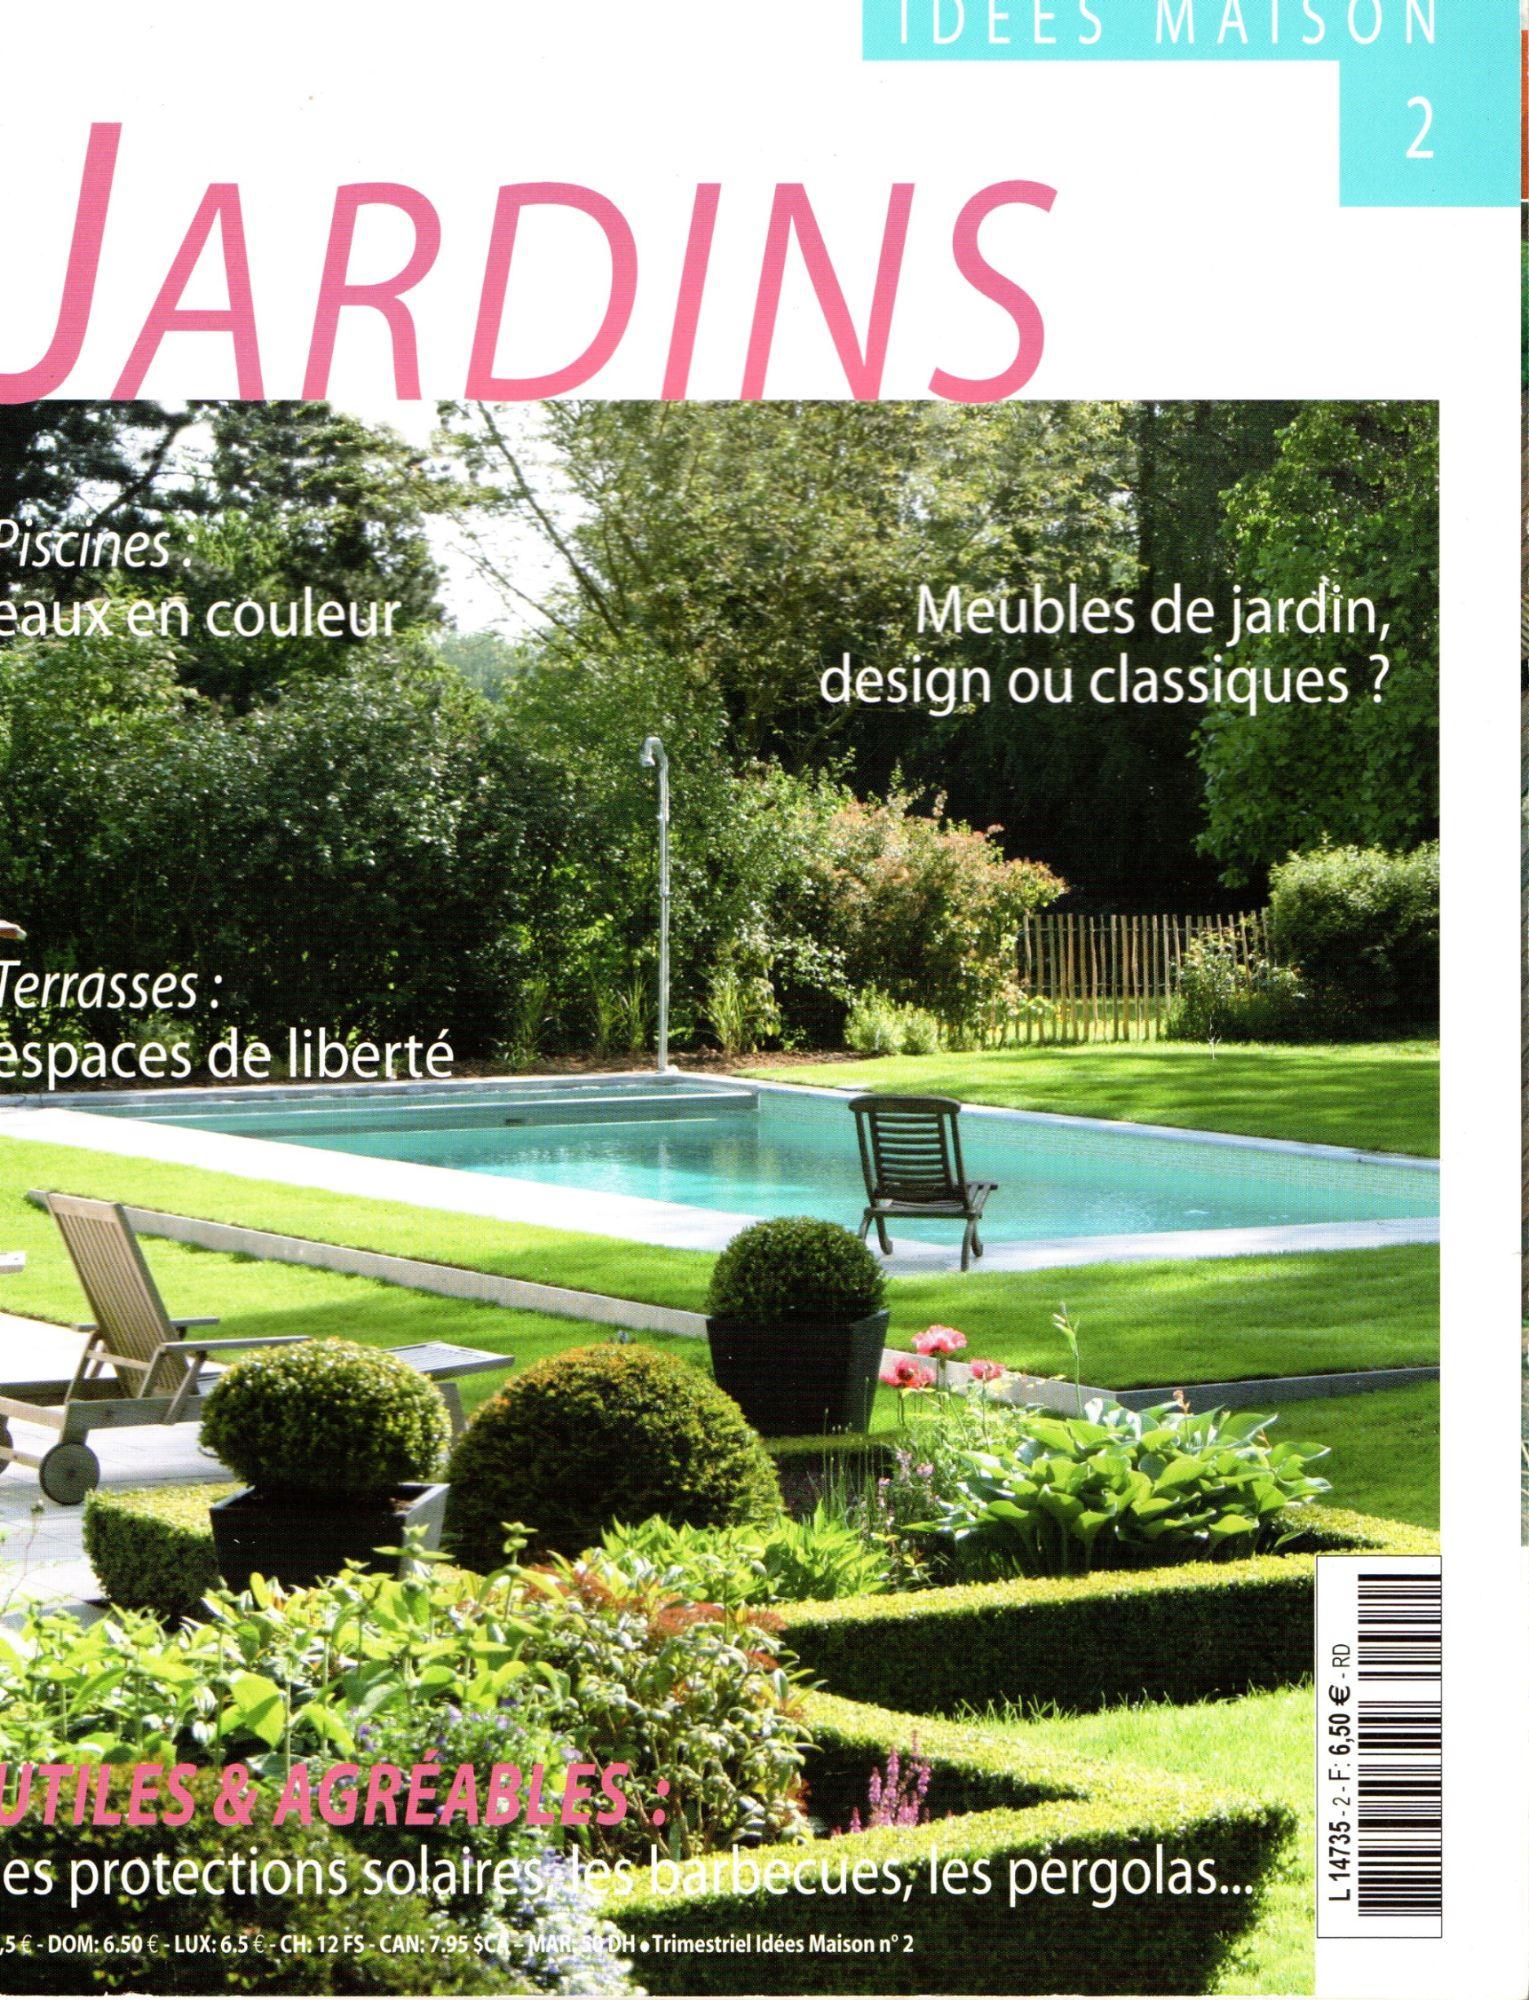 Idees Maison 2 Jardins Piscines Terrasses Meubles De Jardin